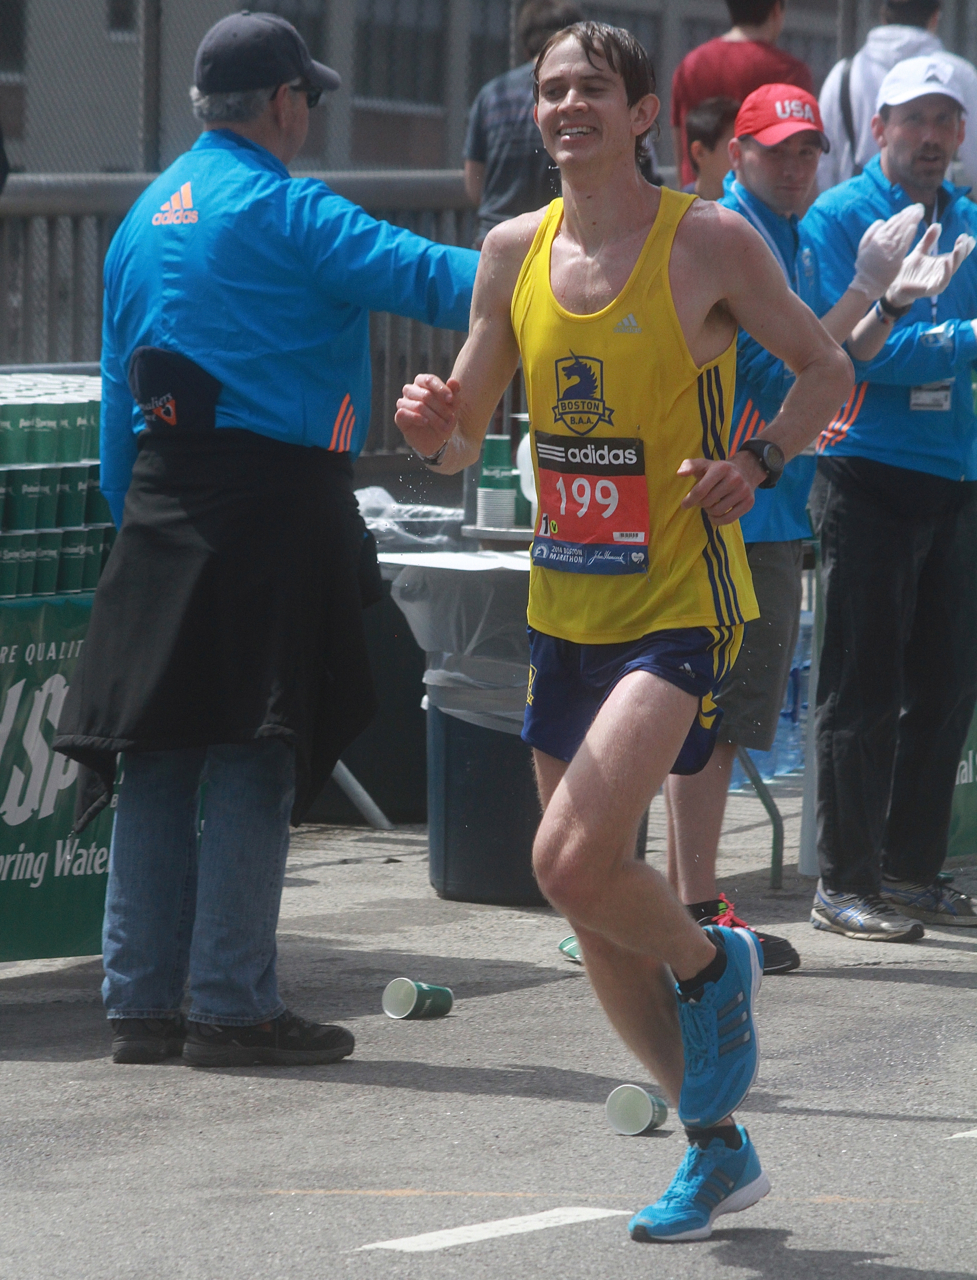 boston marathon april 21 beacon street elite runners number 199